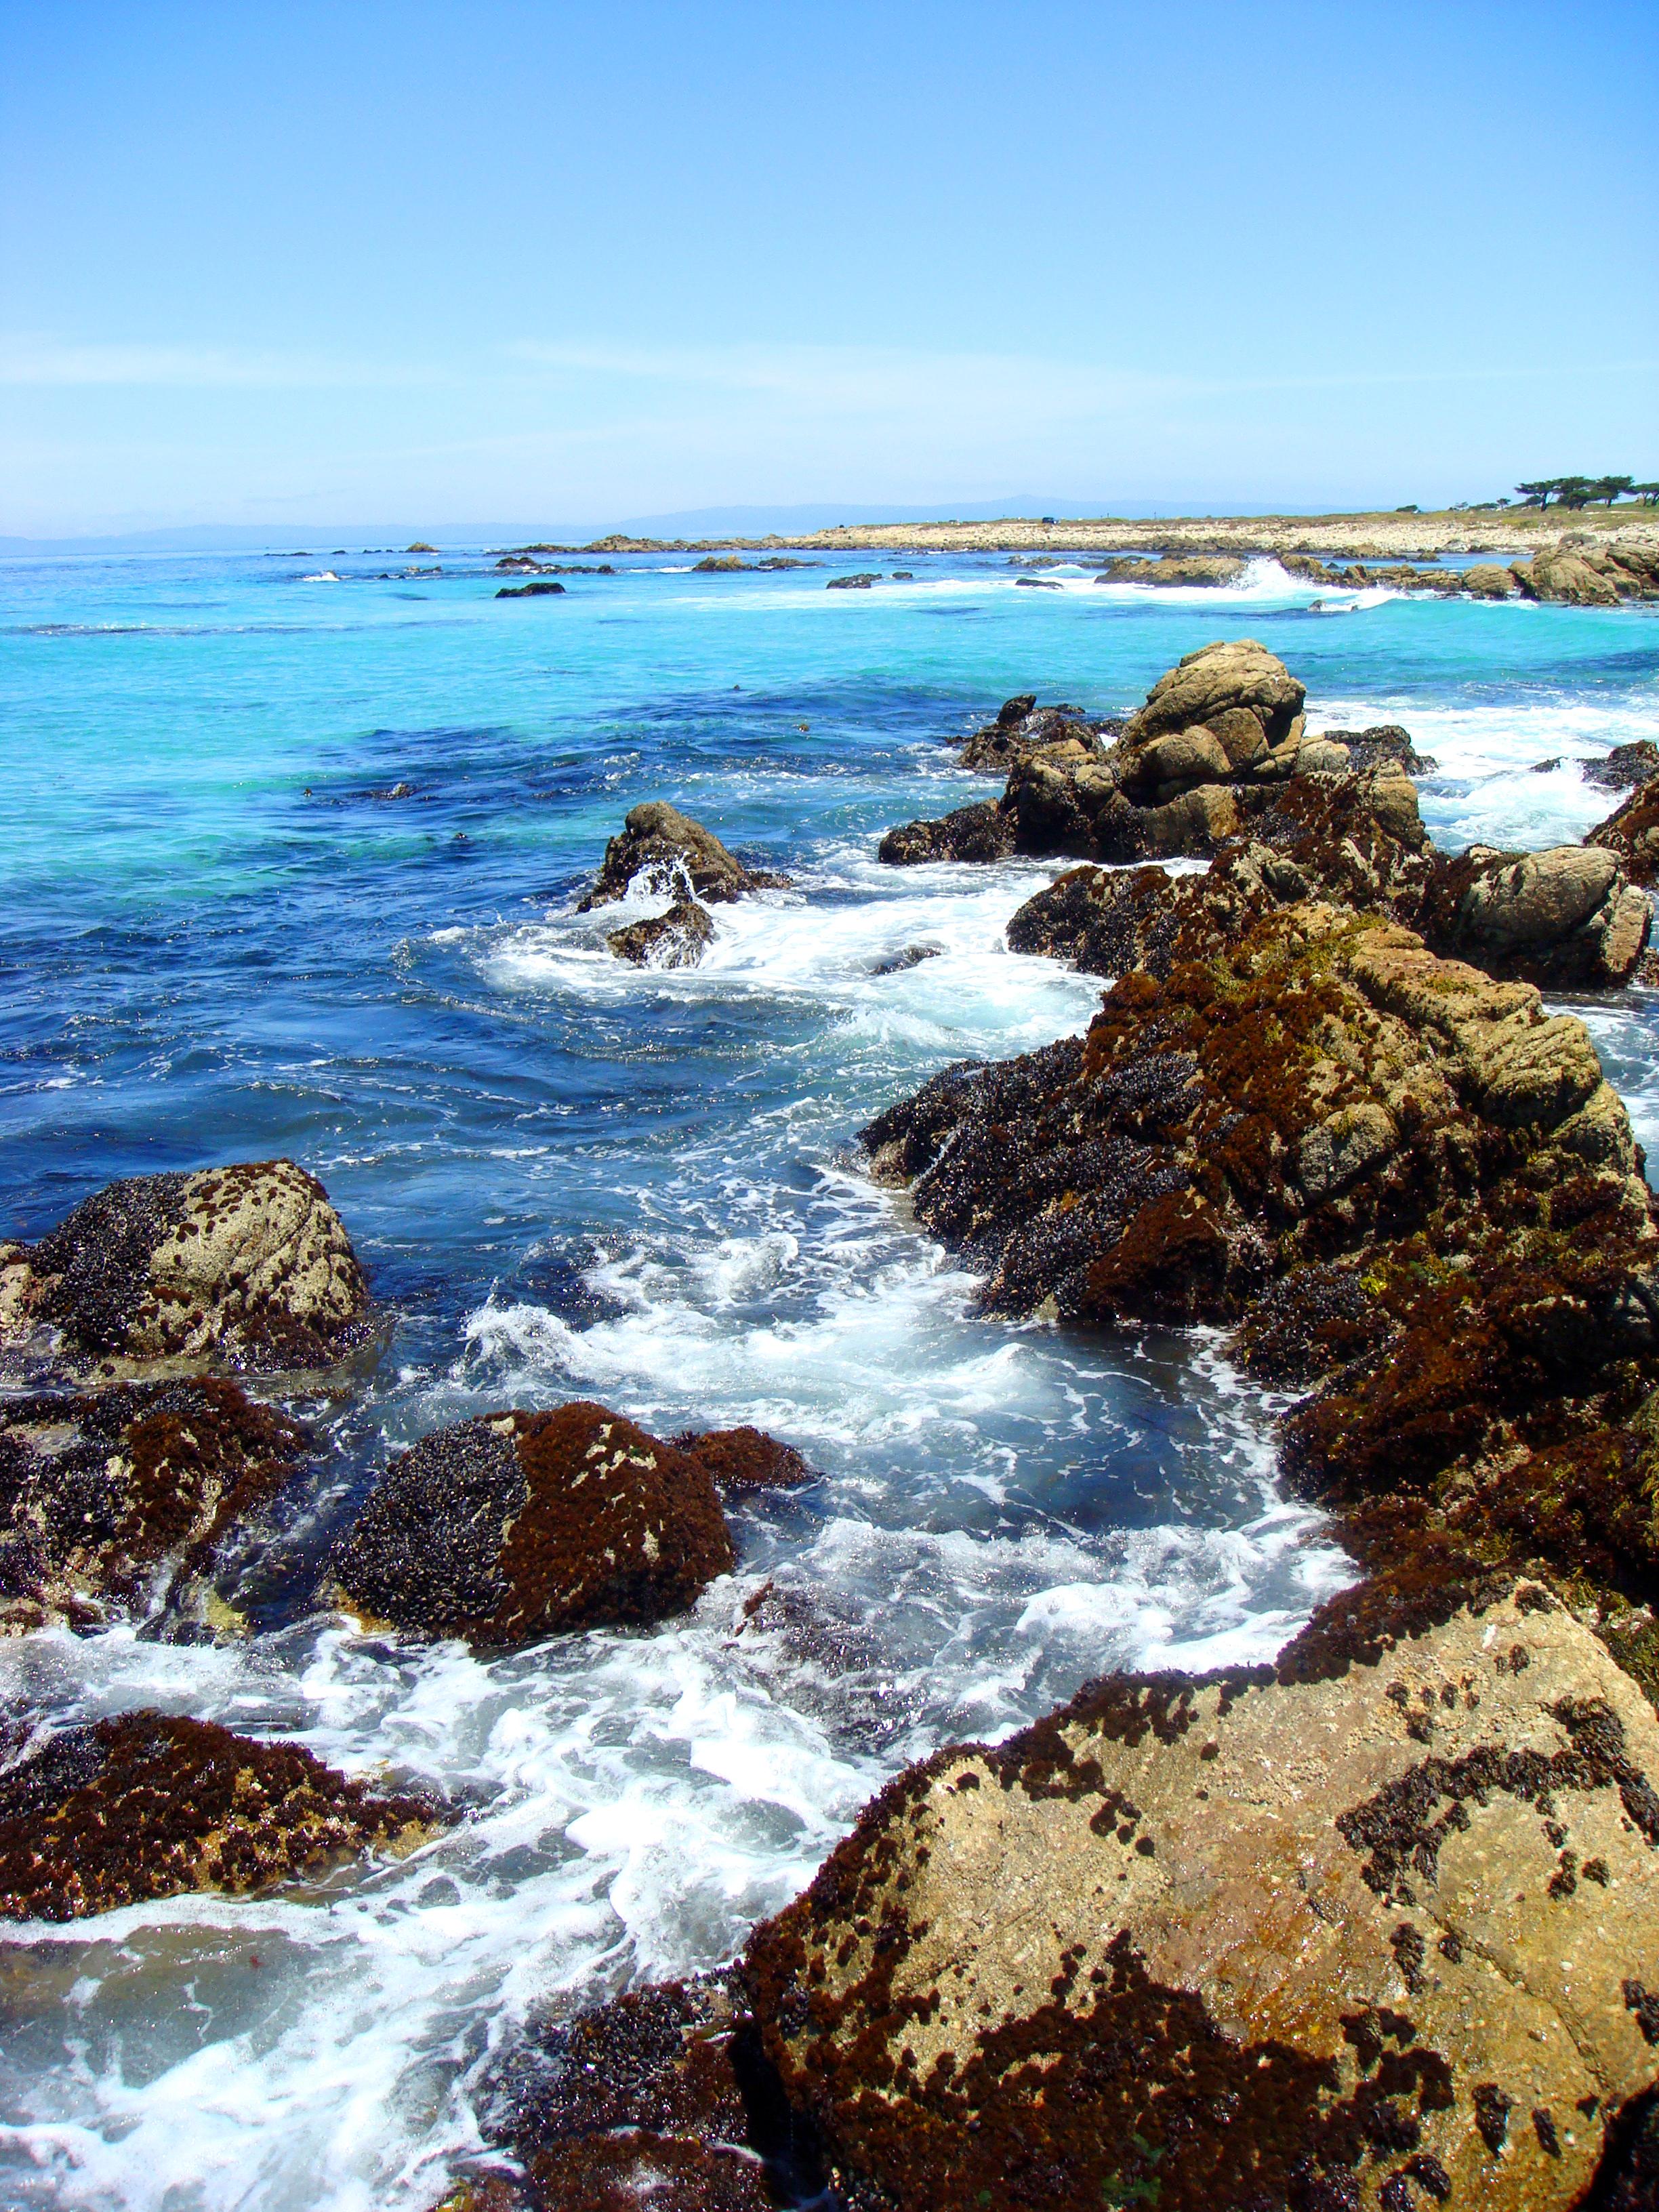 ocean pebble beach image